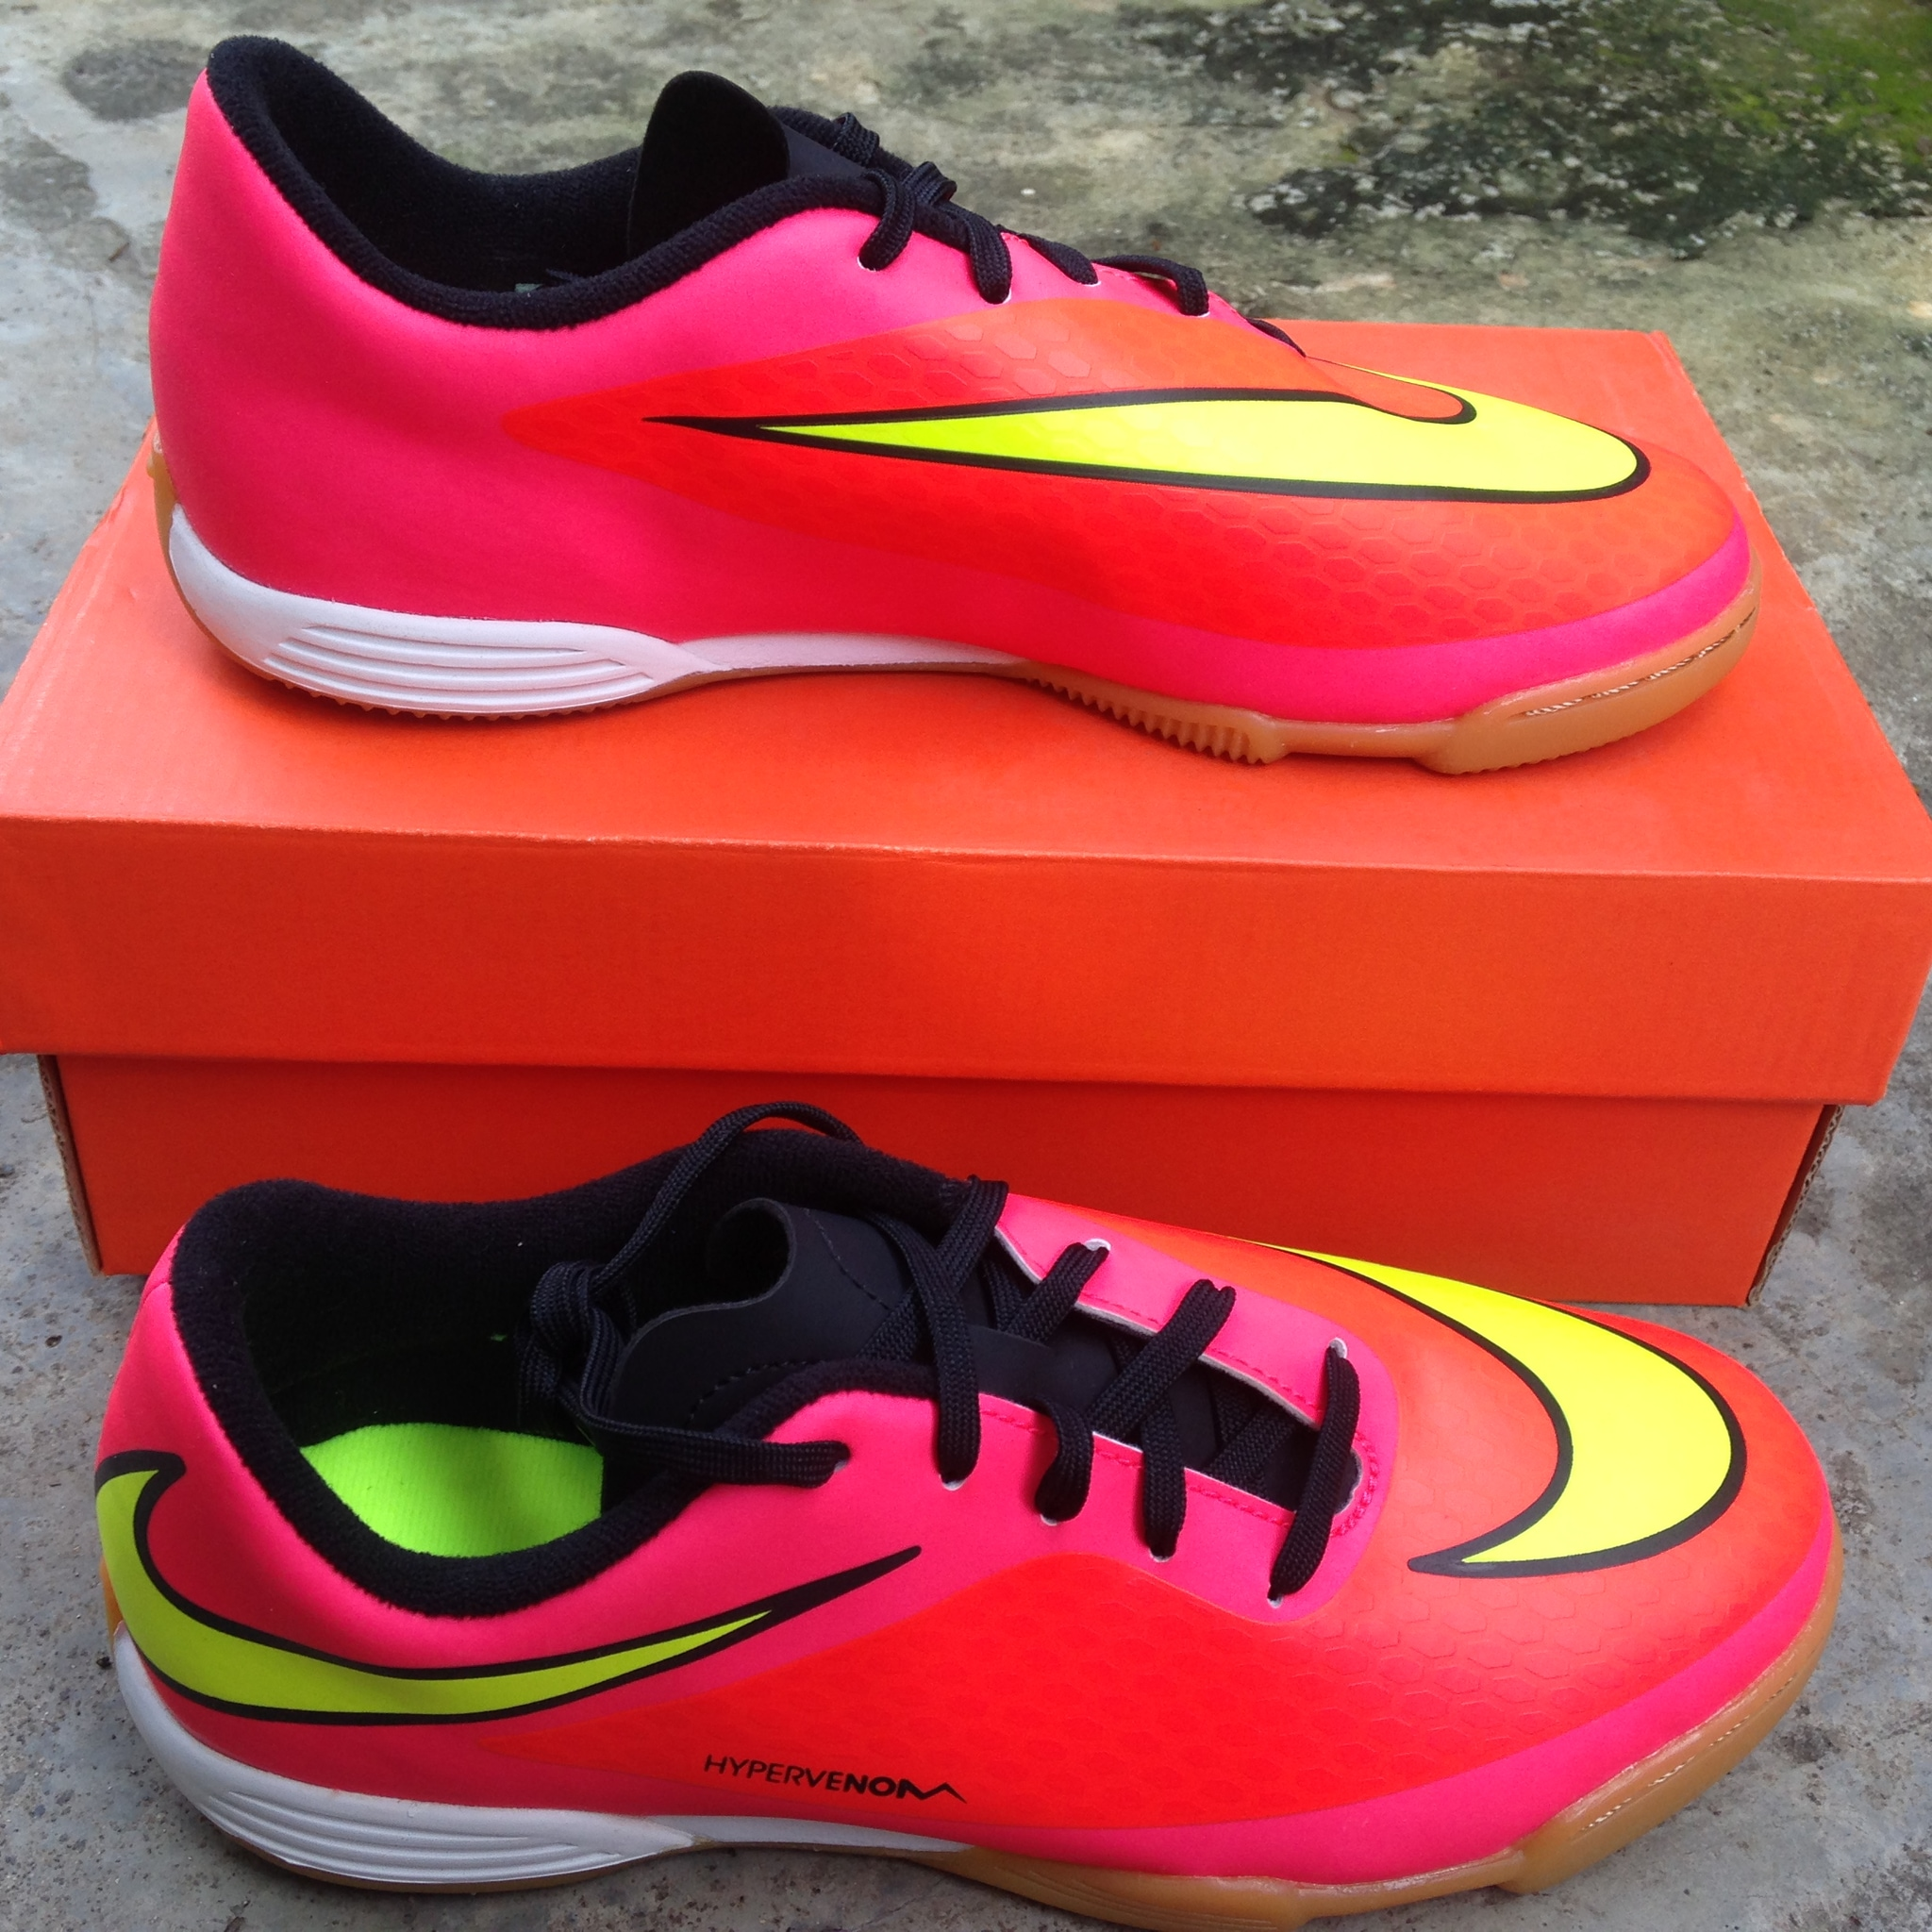 Terjual Sepatu Futsal & Kets Anak Adidas Nike ALL ORIGINAL